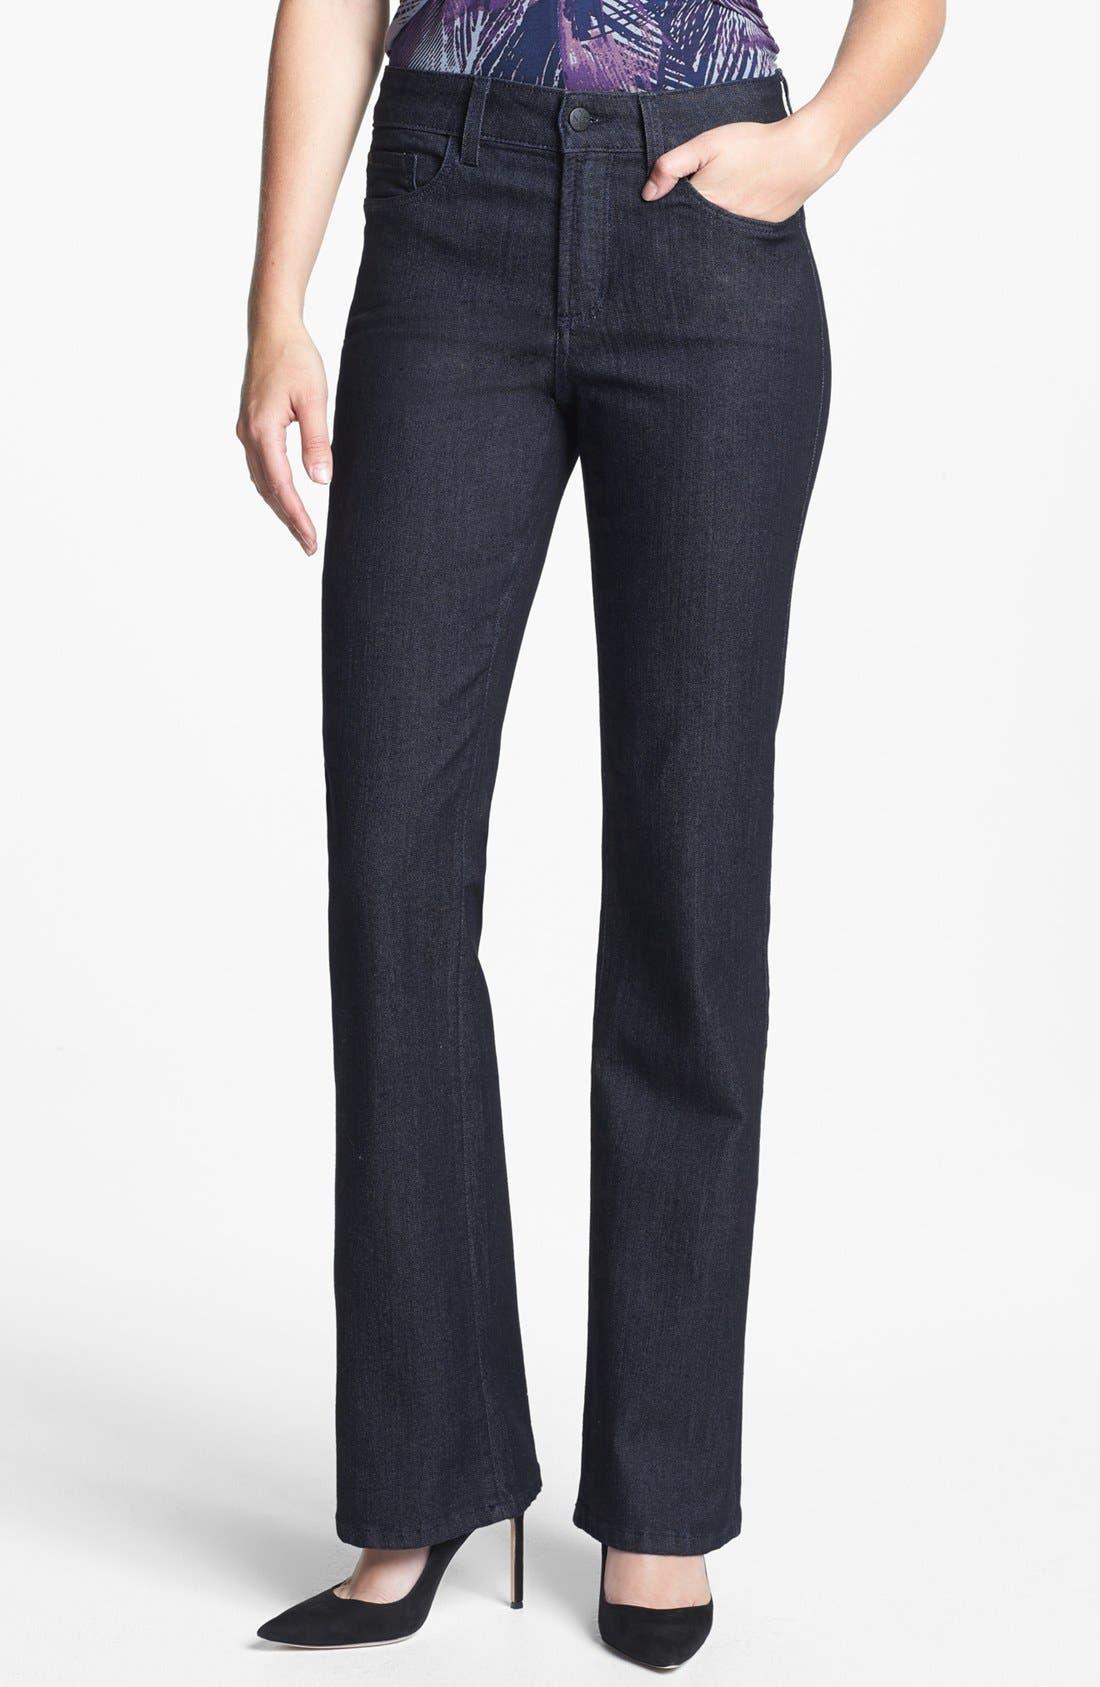 Main Image - NYDJ 'Barbara' Embellished Bootcut Jeans (Dark Enzyme) (Regular & Petite)